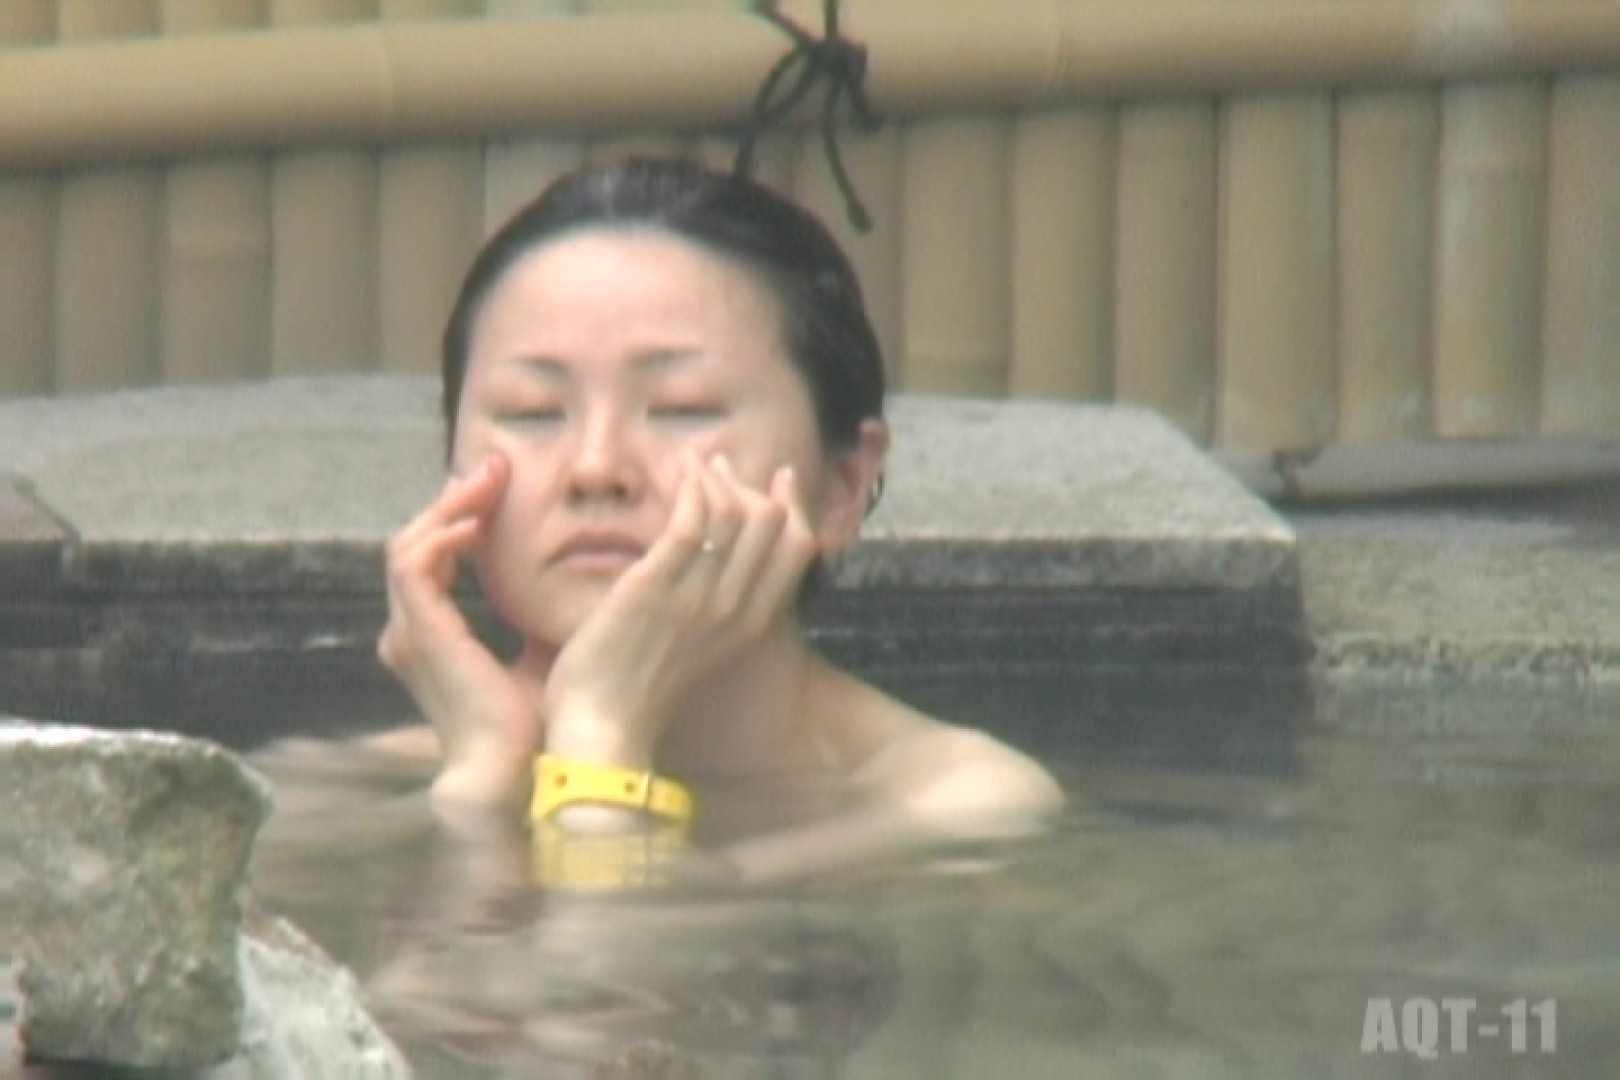 Aquaな露天風呂Vol.802 女体盗撮 盗み撮りSEX無修正画像 85連発 50